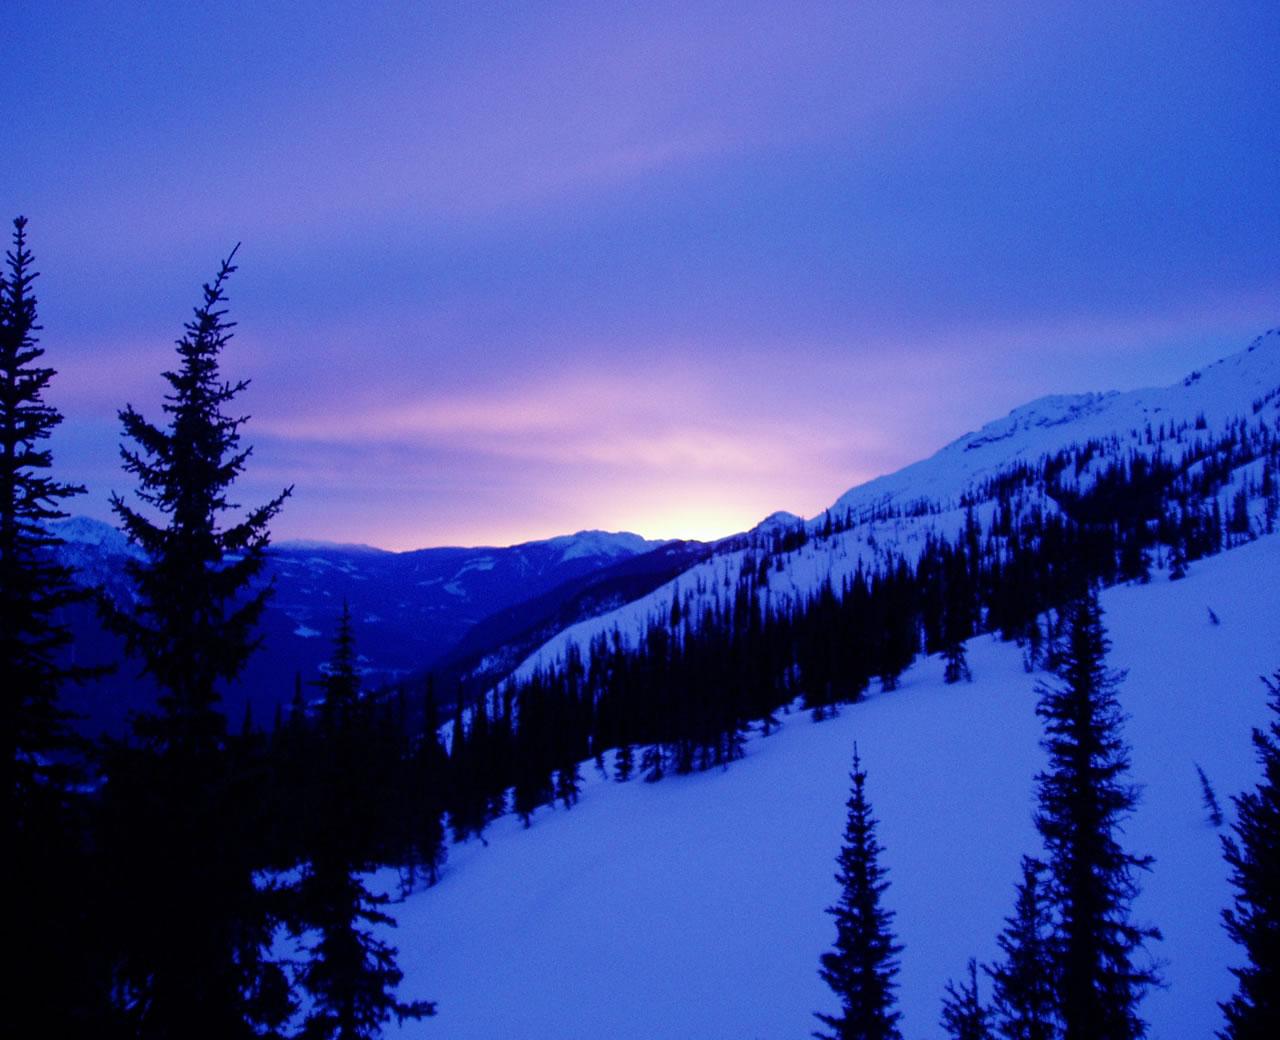 winter solstice half light sunrise 1280x1040